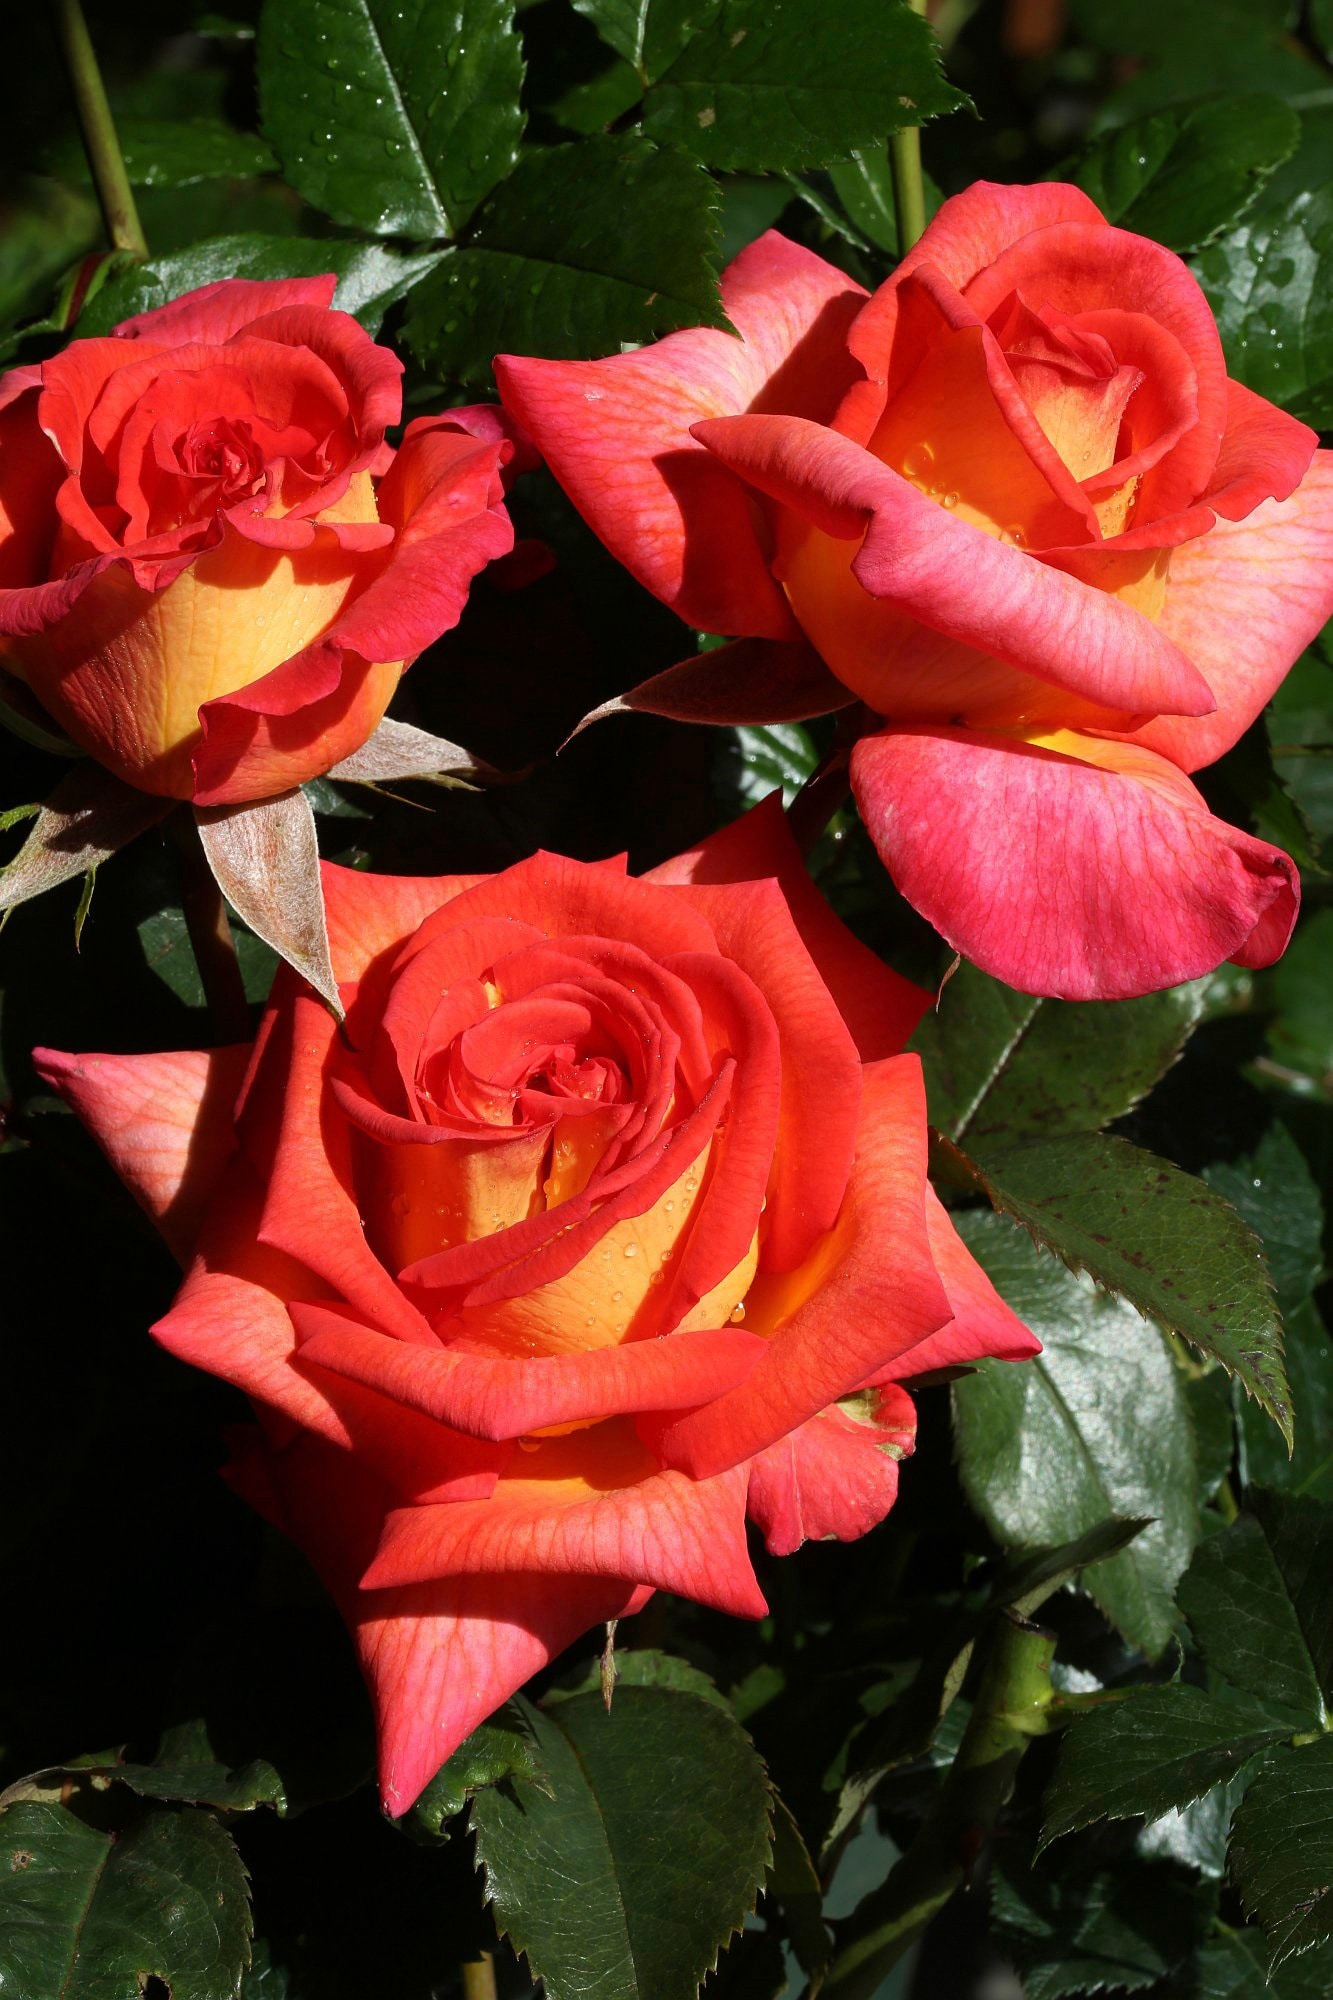 BCM Beetpflanze Rose Parfum De Grasse, Höhe 30 cm, 1 Pflanze orange Beetpflanzen Pflanzen Garten Balkon